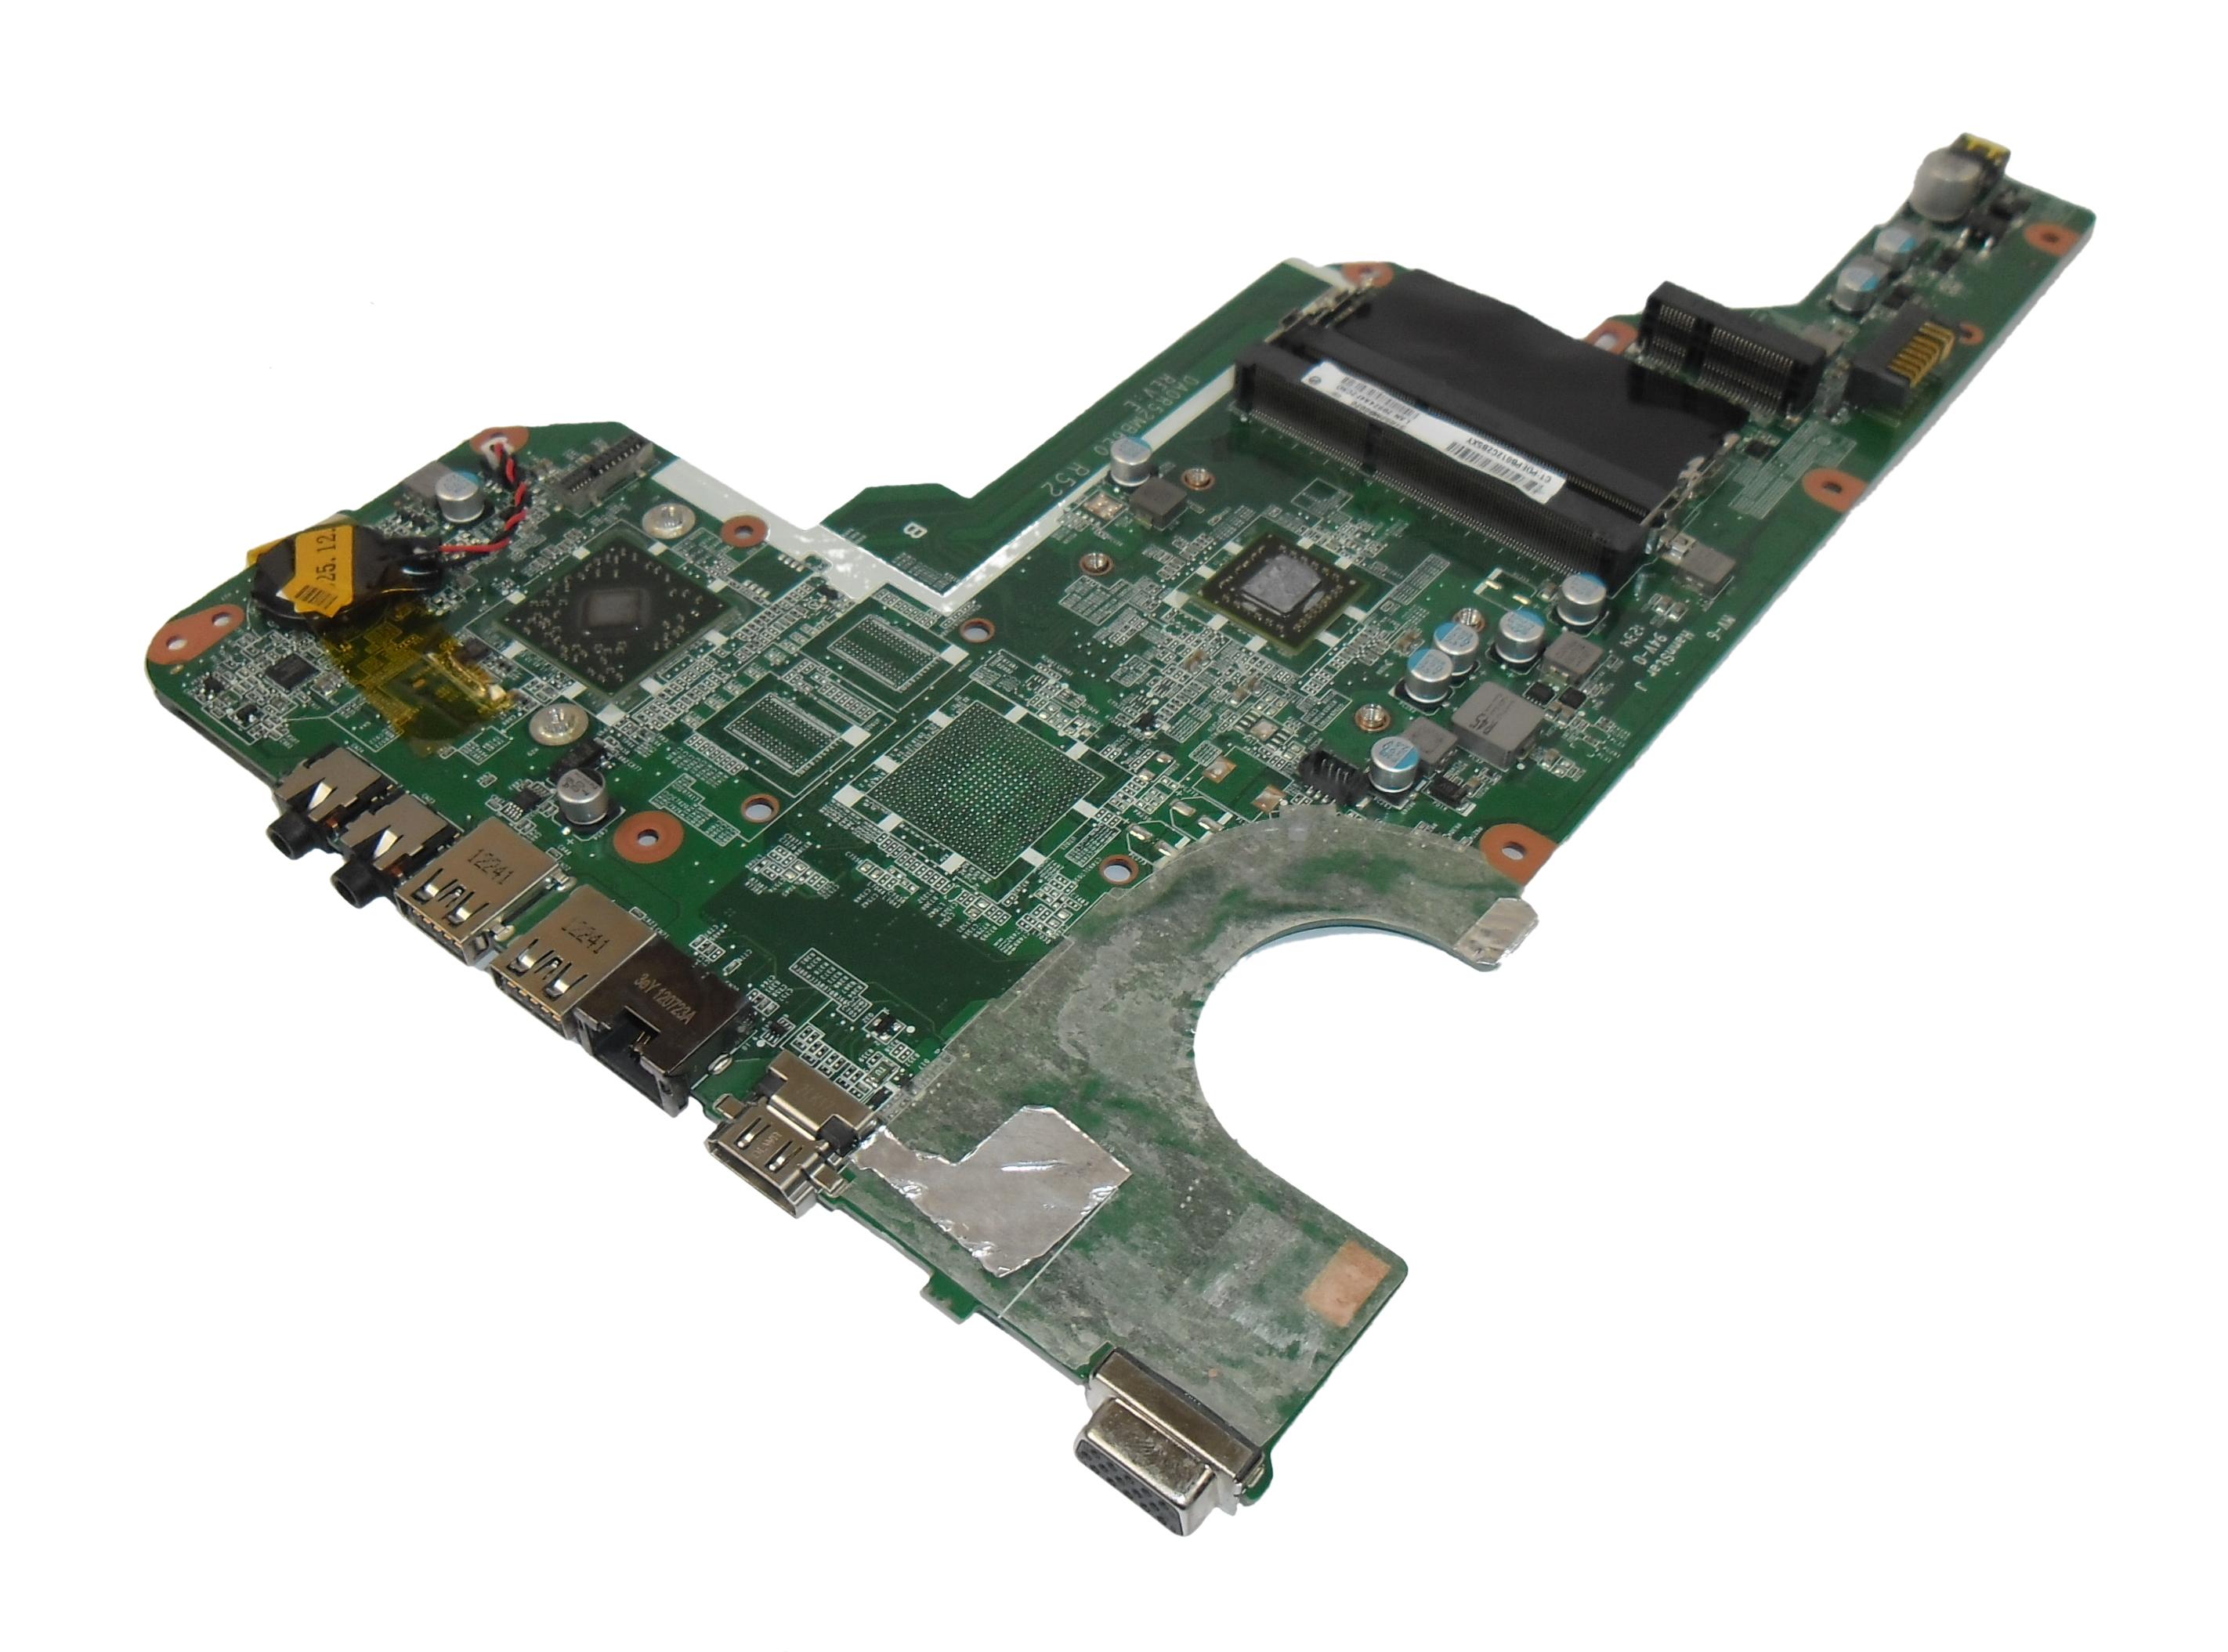 697230-501 HP g6-2240sa Motherboard with AMD E2-1800 CPU - 31R52MB0020